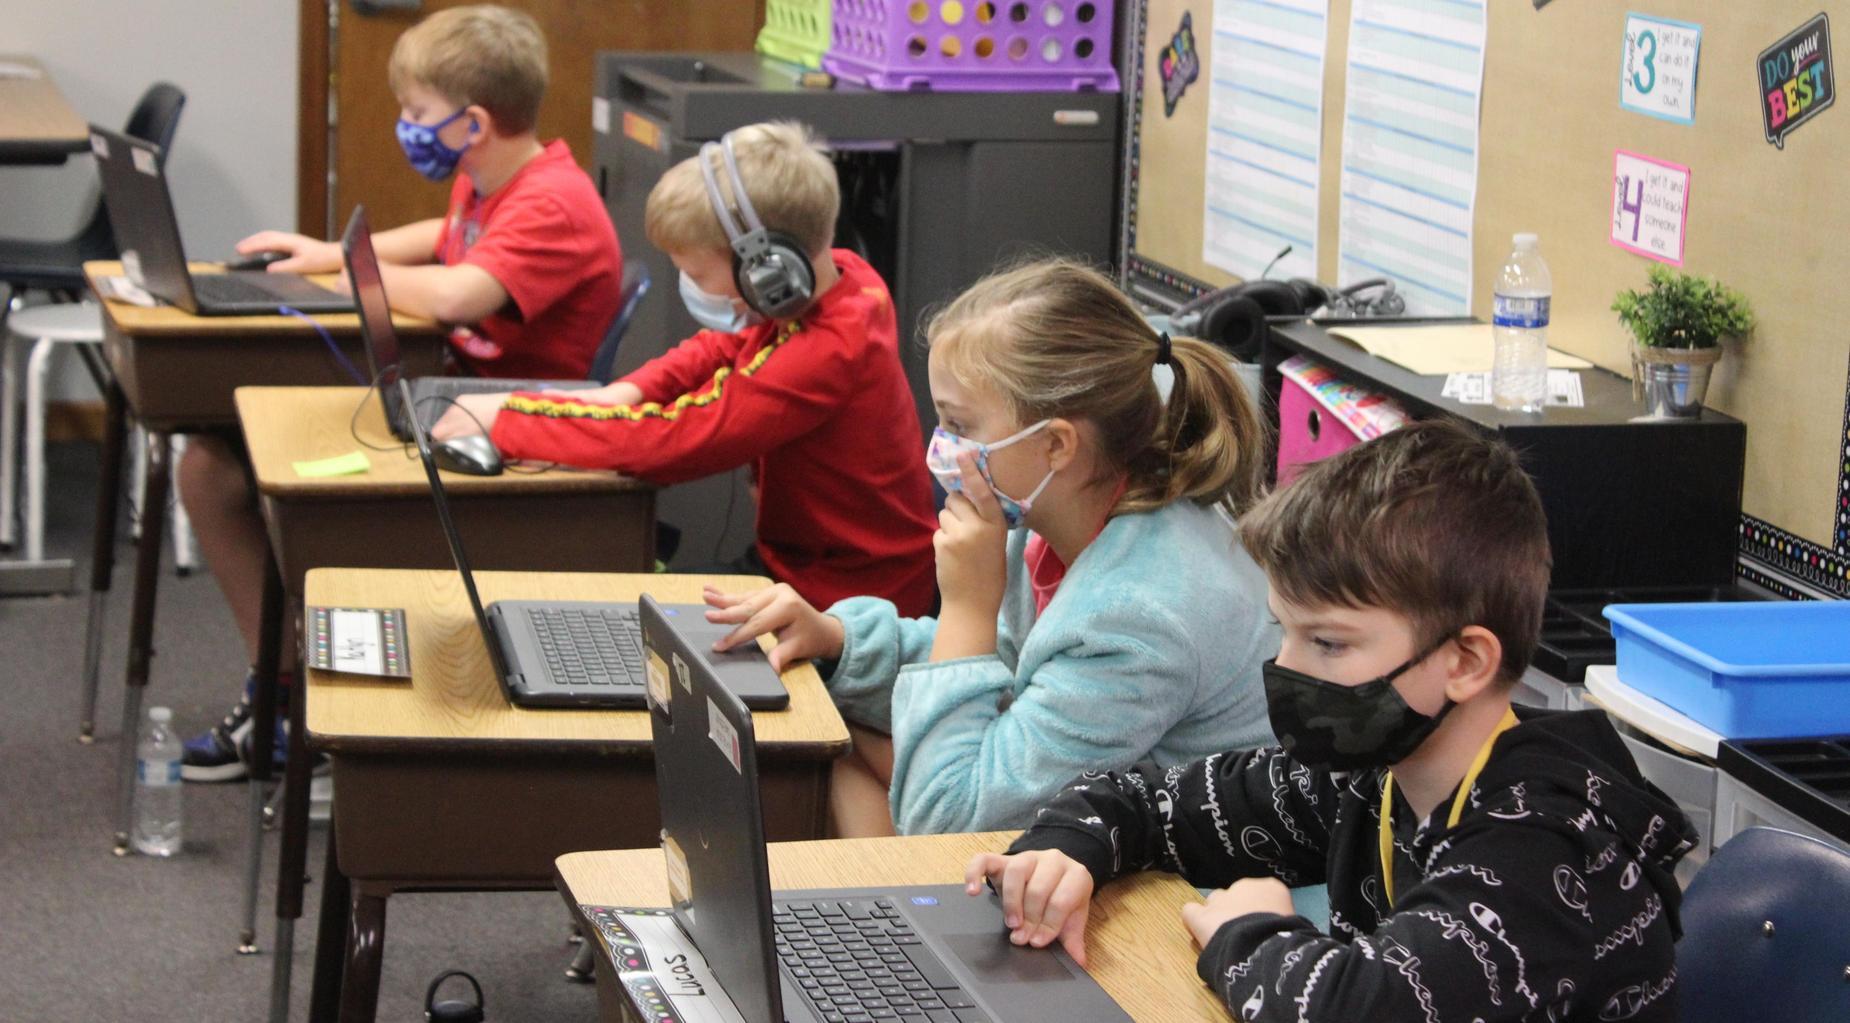 Students work on digital classwork.